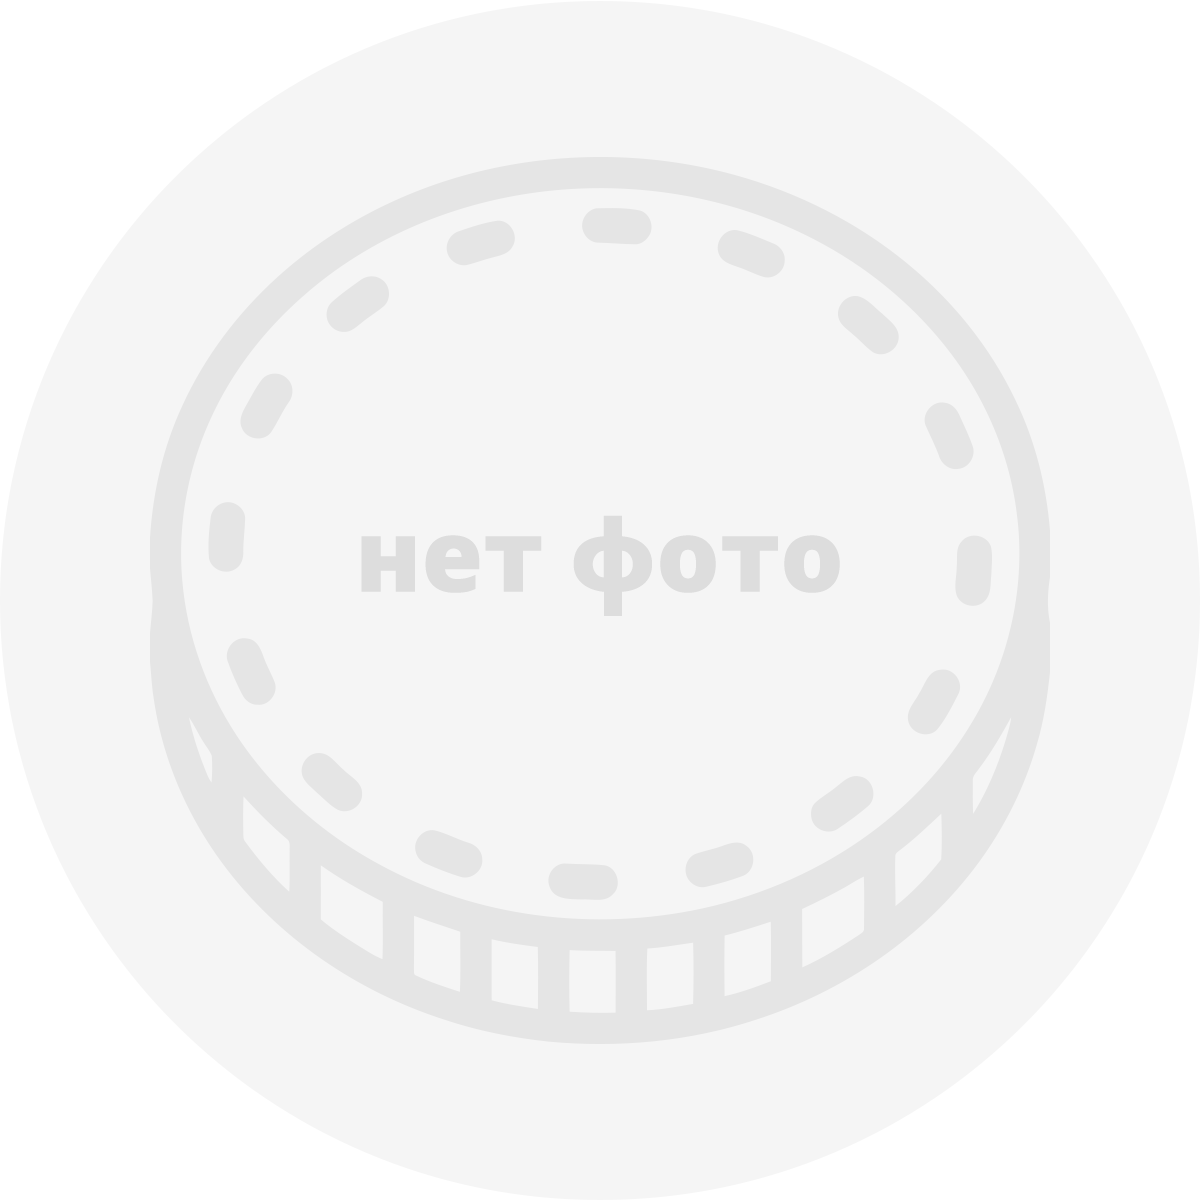 Таджикистан, Набор монет (2015 г.)